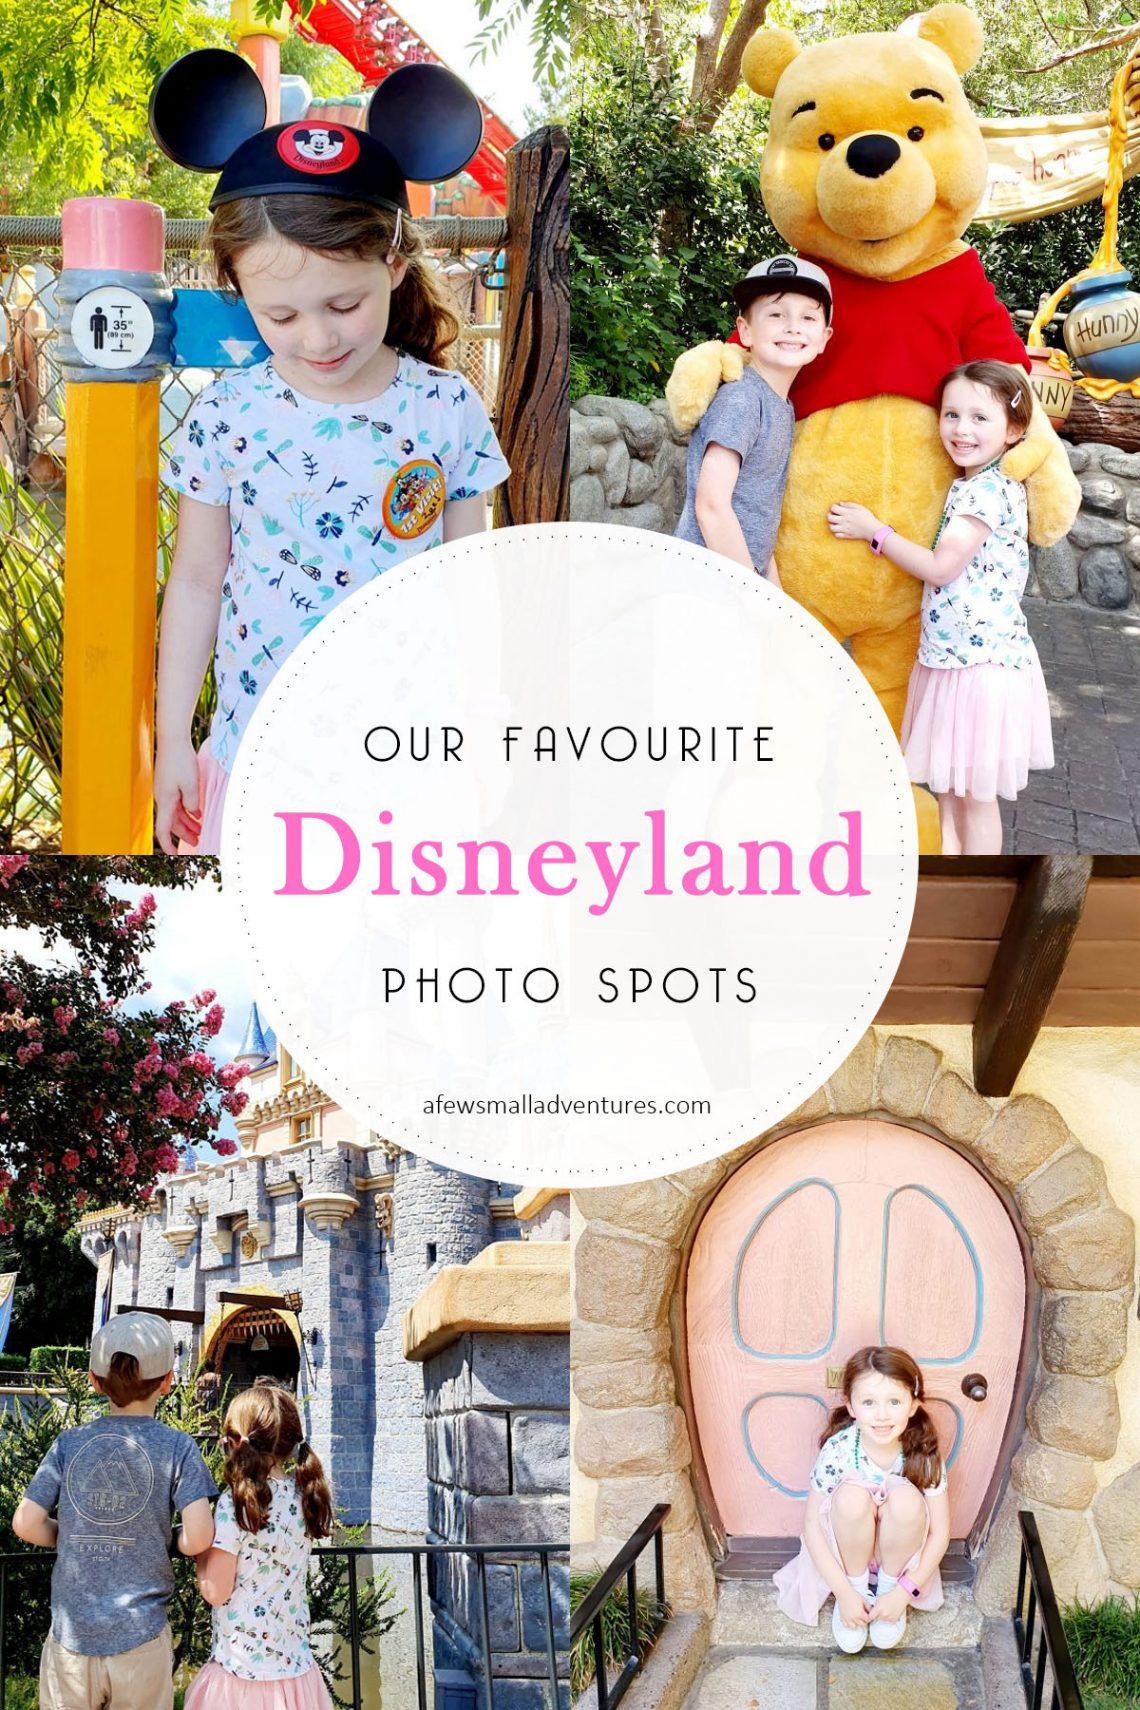 DIsneyland Photo Spots